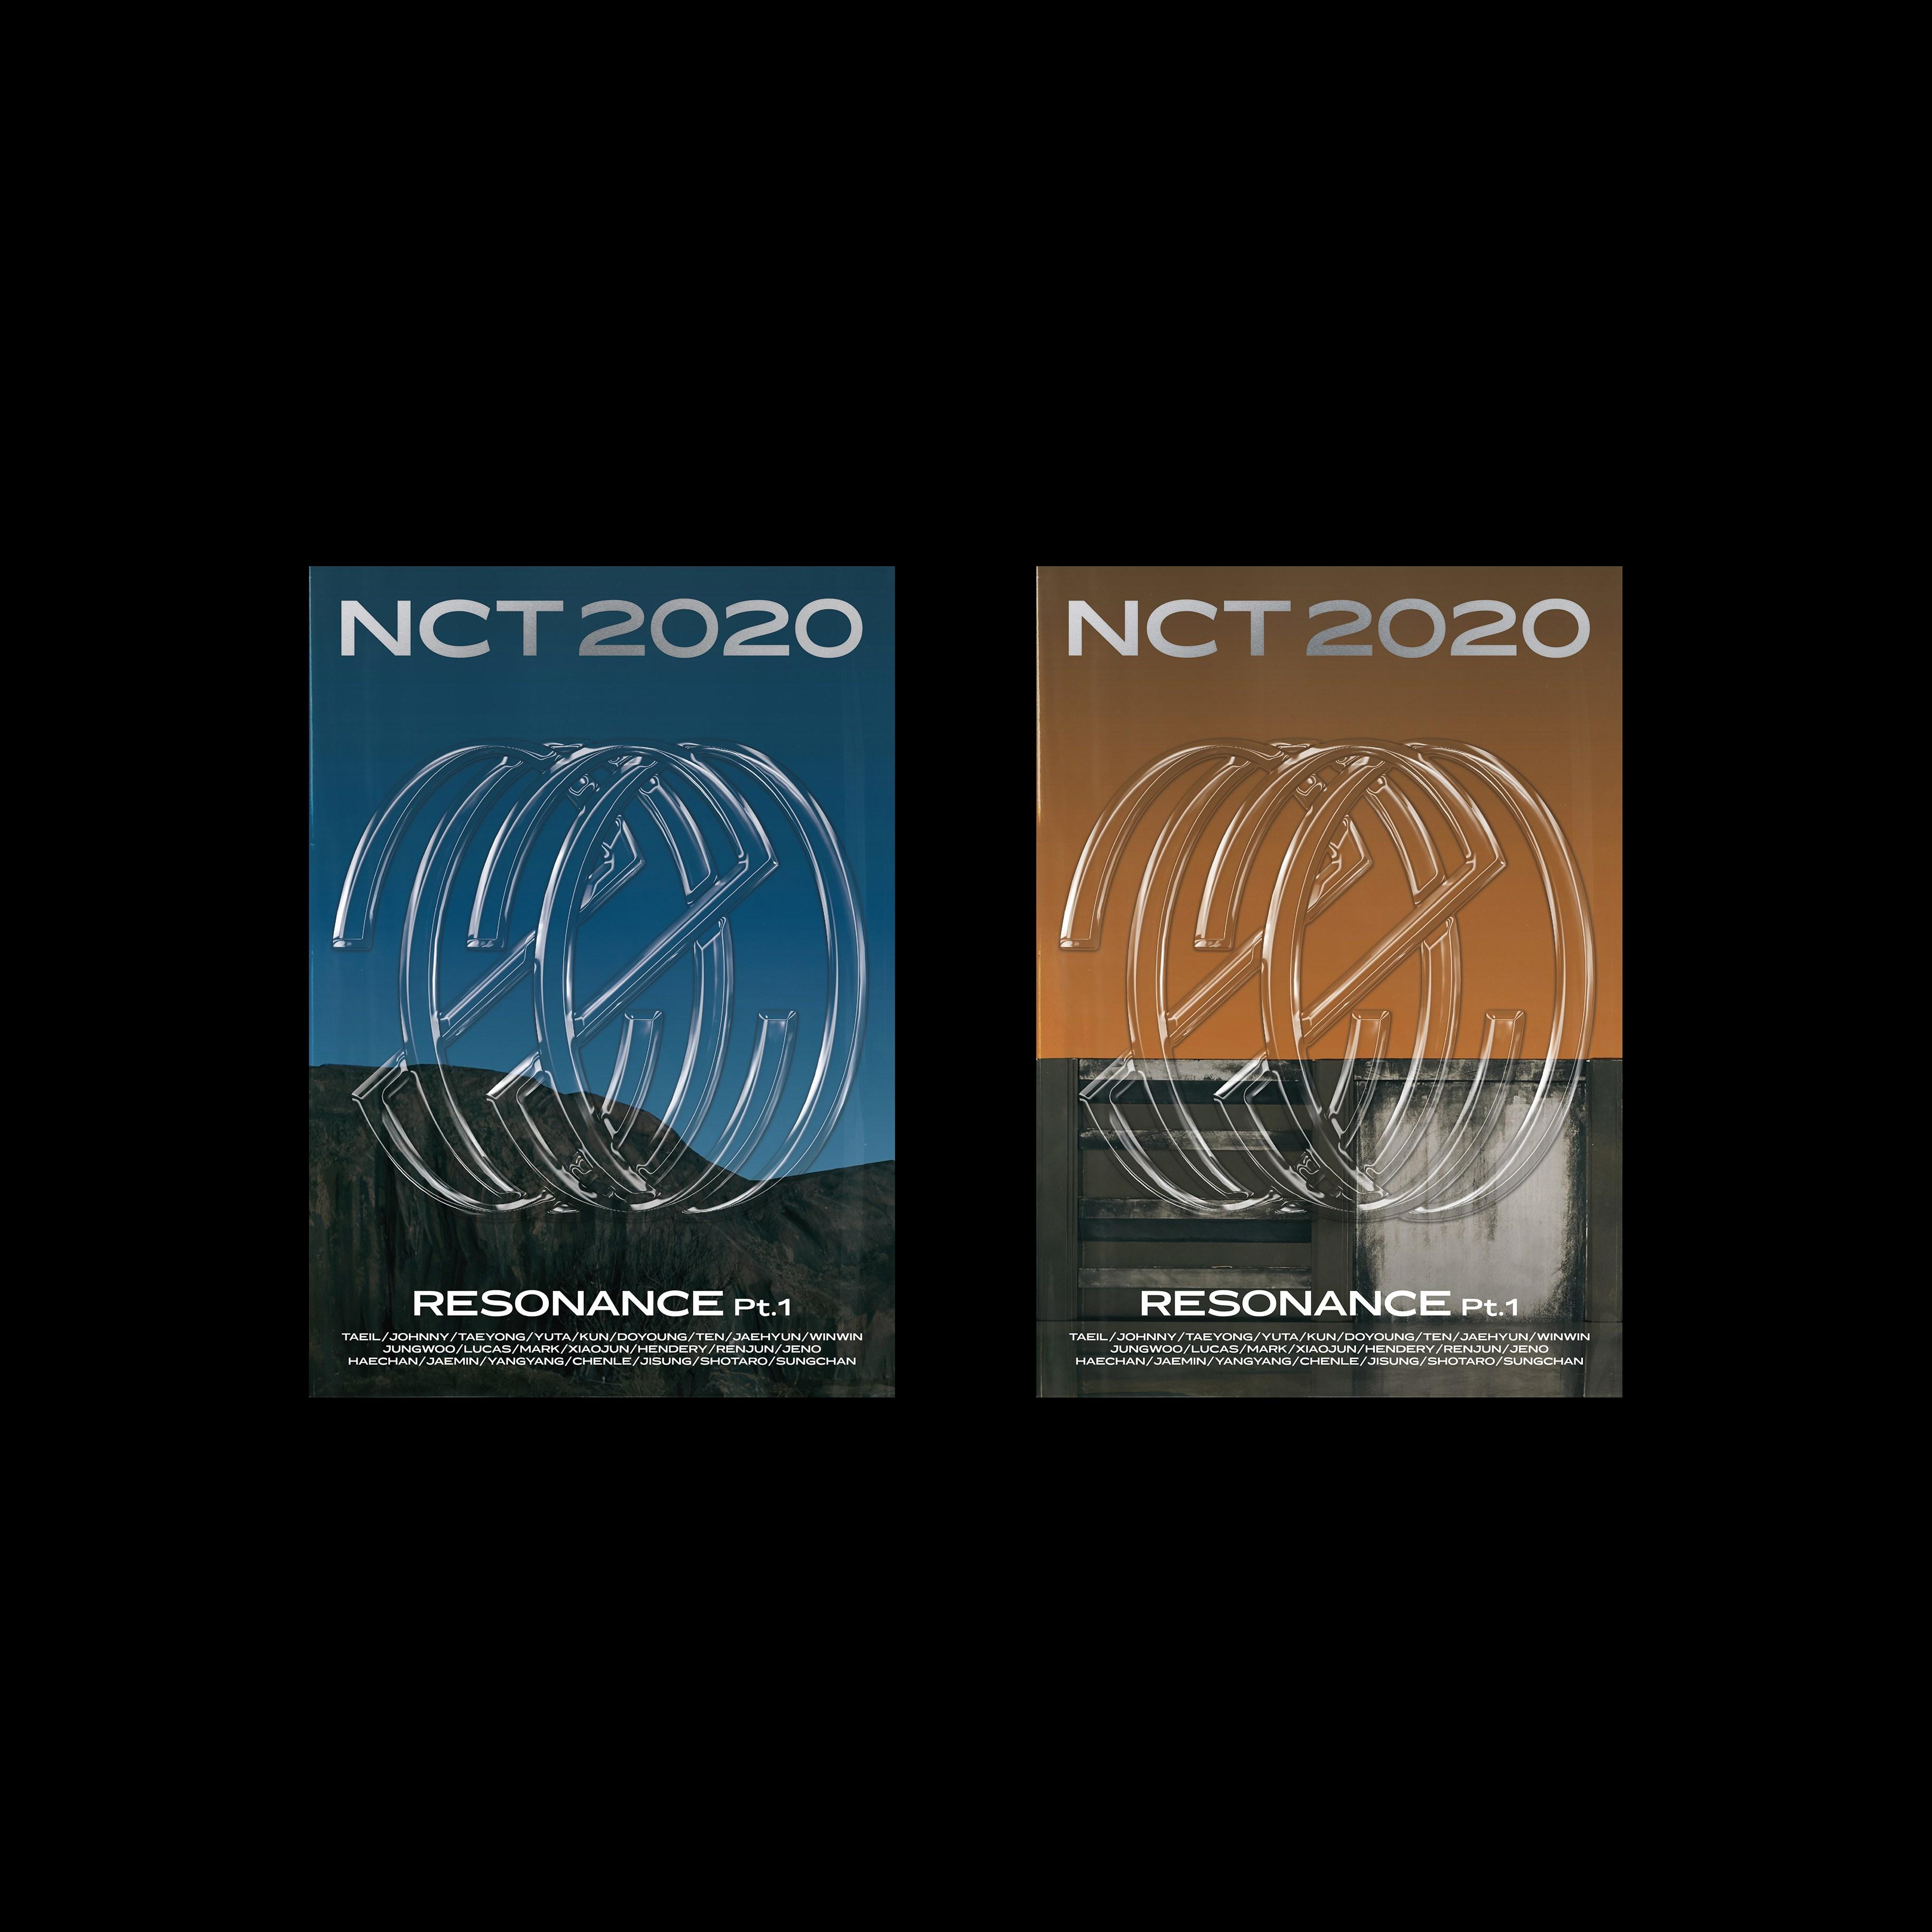 NCT2020 - The 2nd Album RESONANCE Pt.1(자체제작 포카제공), The Future Ver.(포스터 없음)